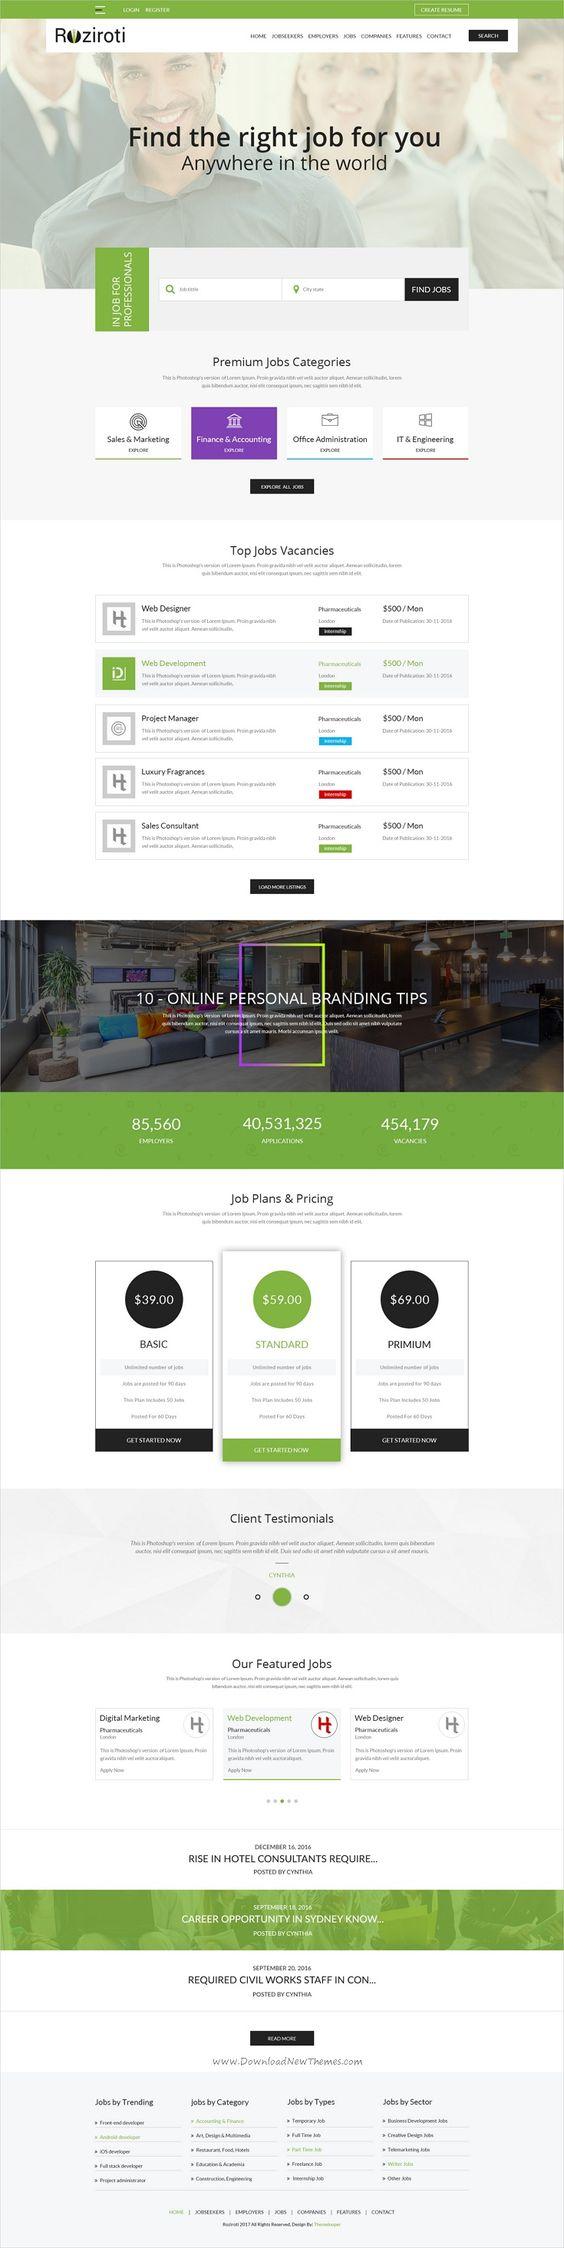 rozi roti job board psd template roziroti is professional psd template for job board portal websites now10153